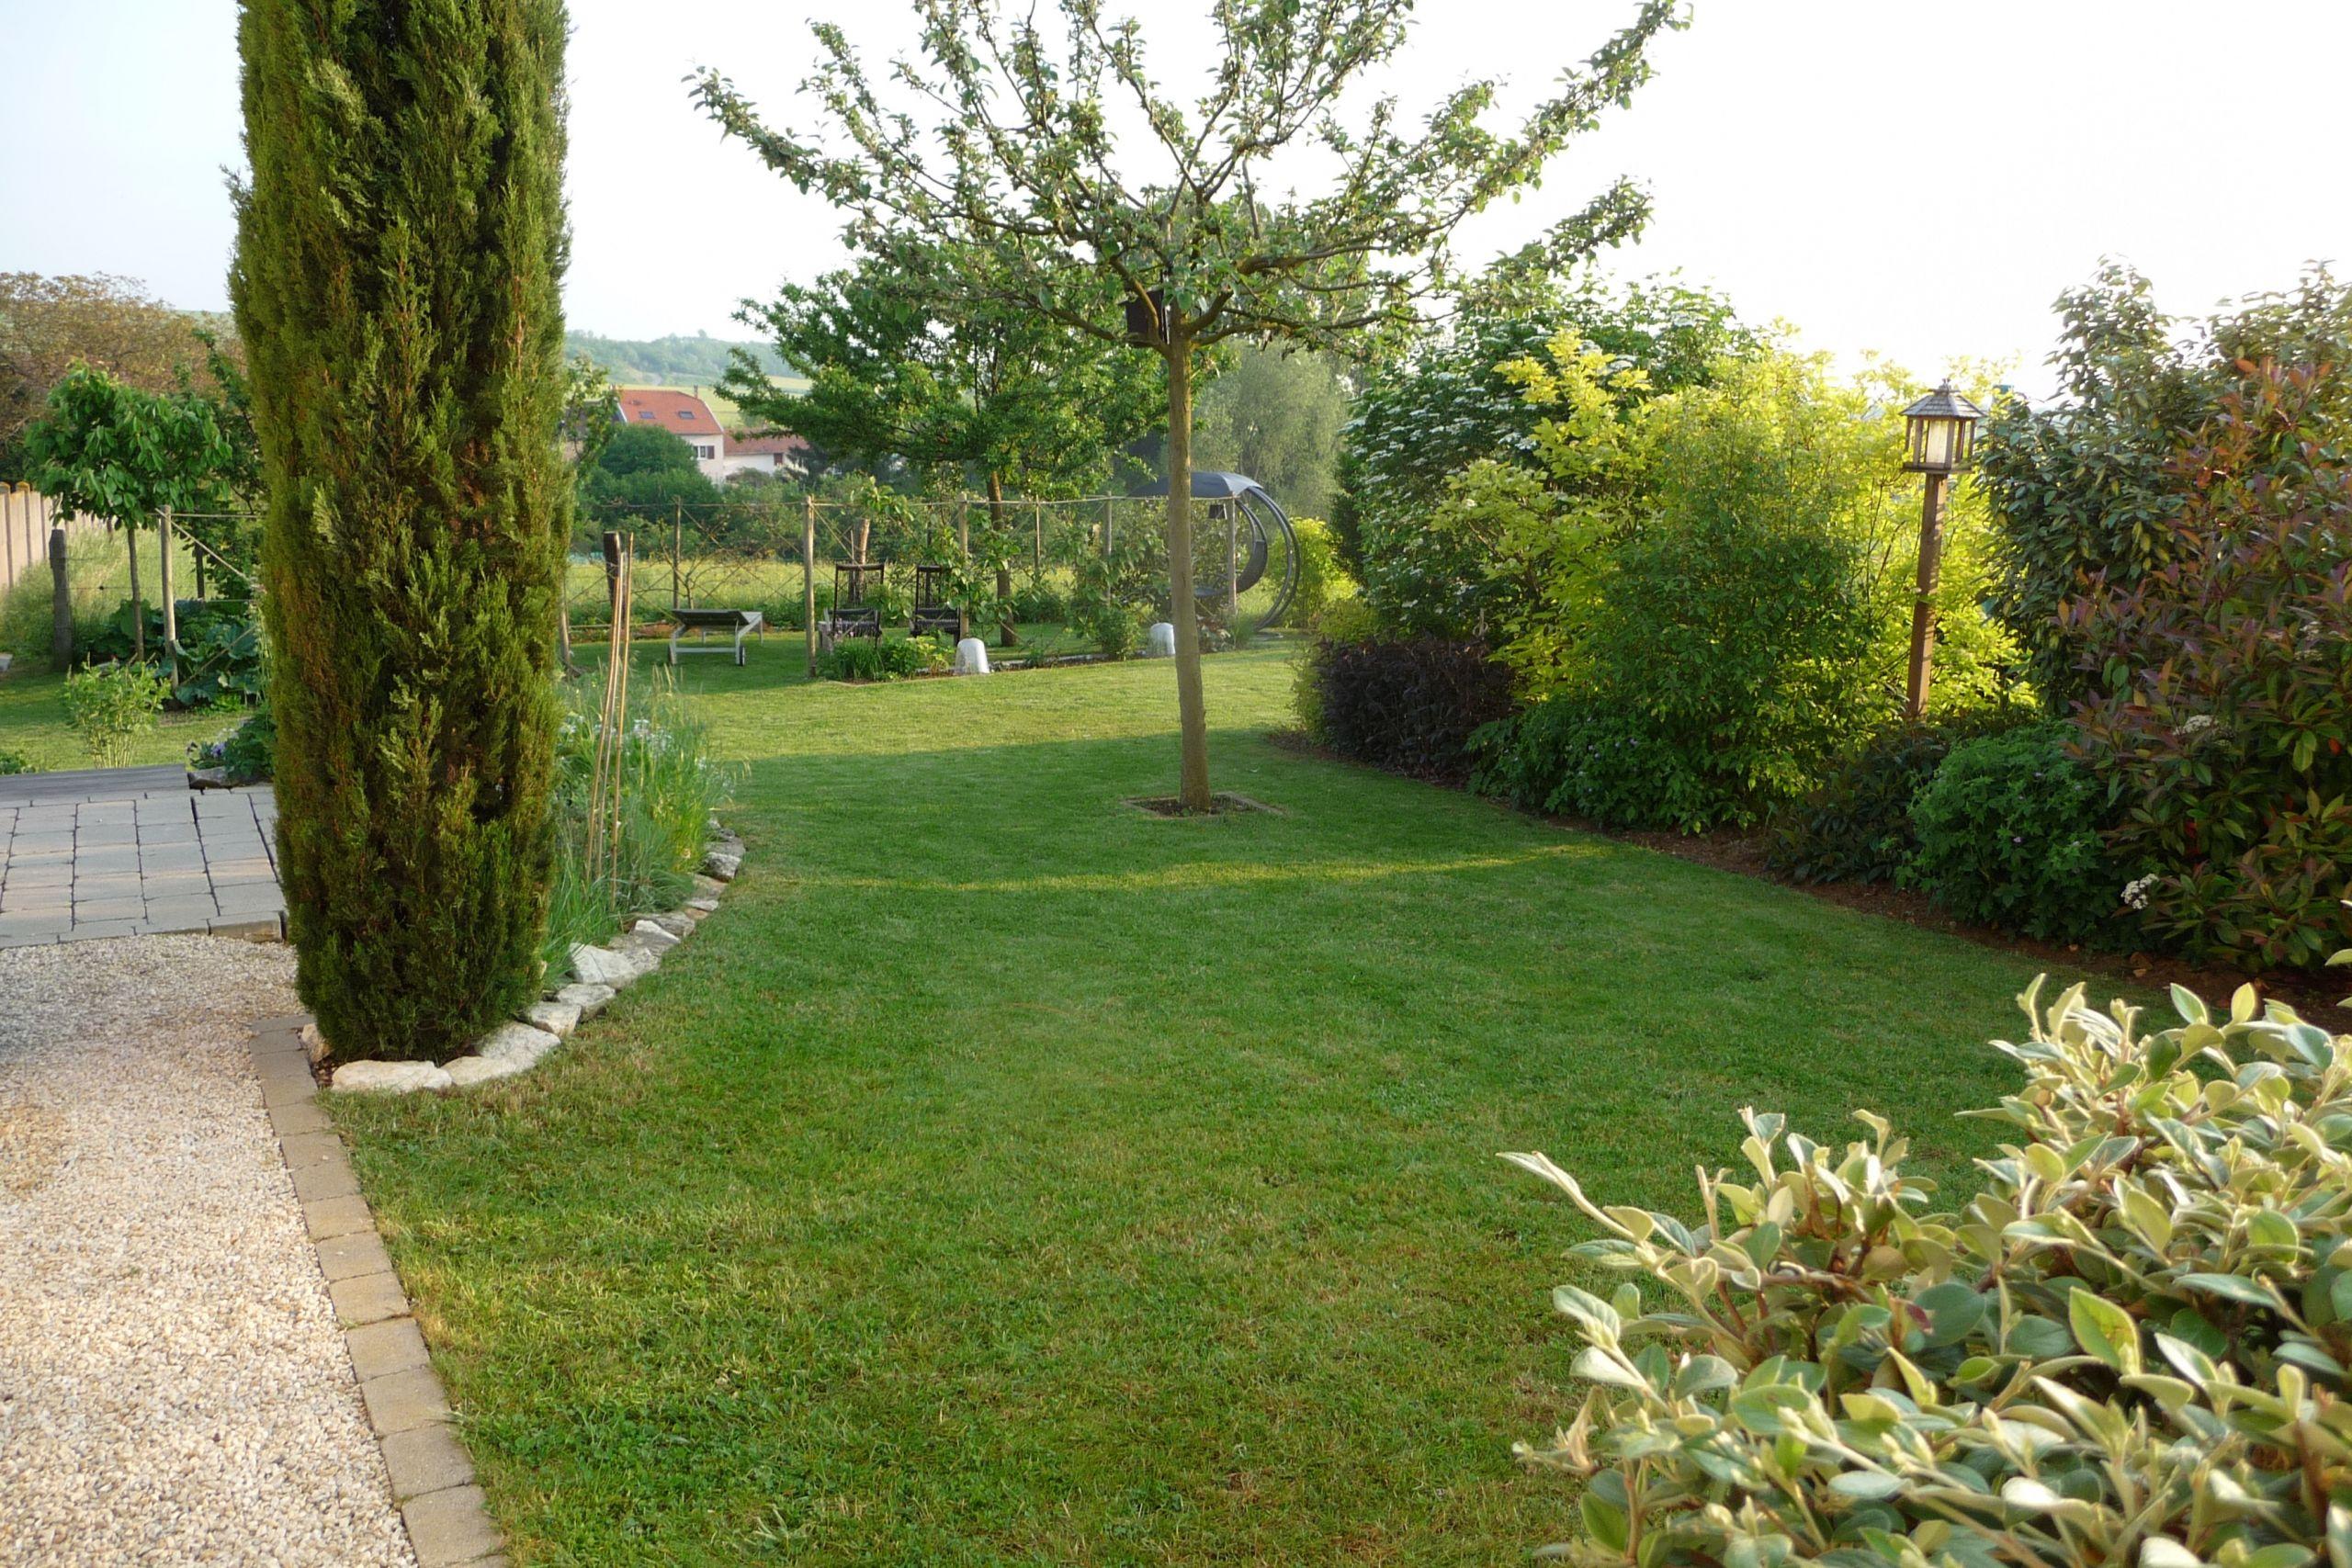 JARDIN PAYSAGER Création d un jardin de campagne